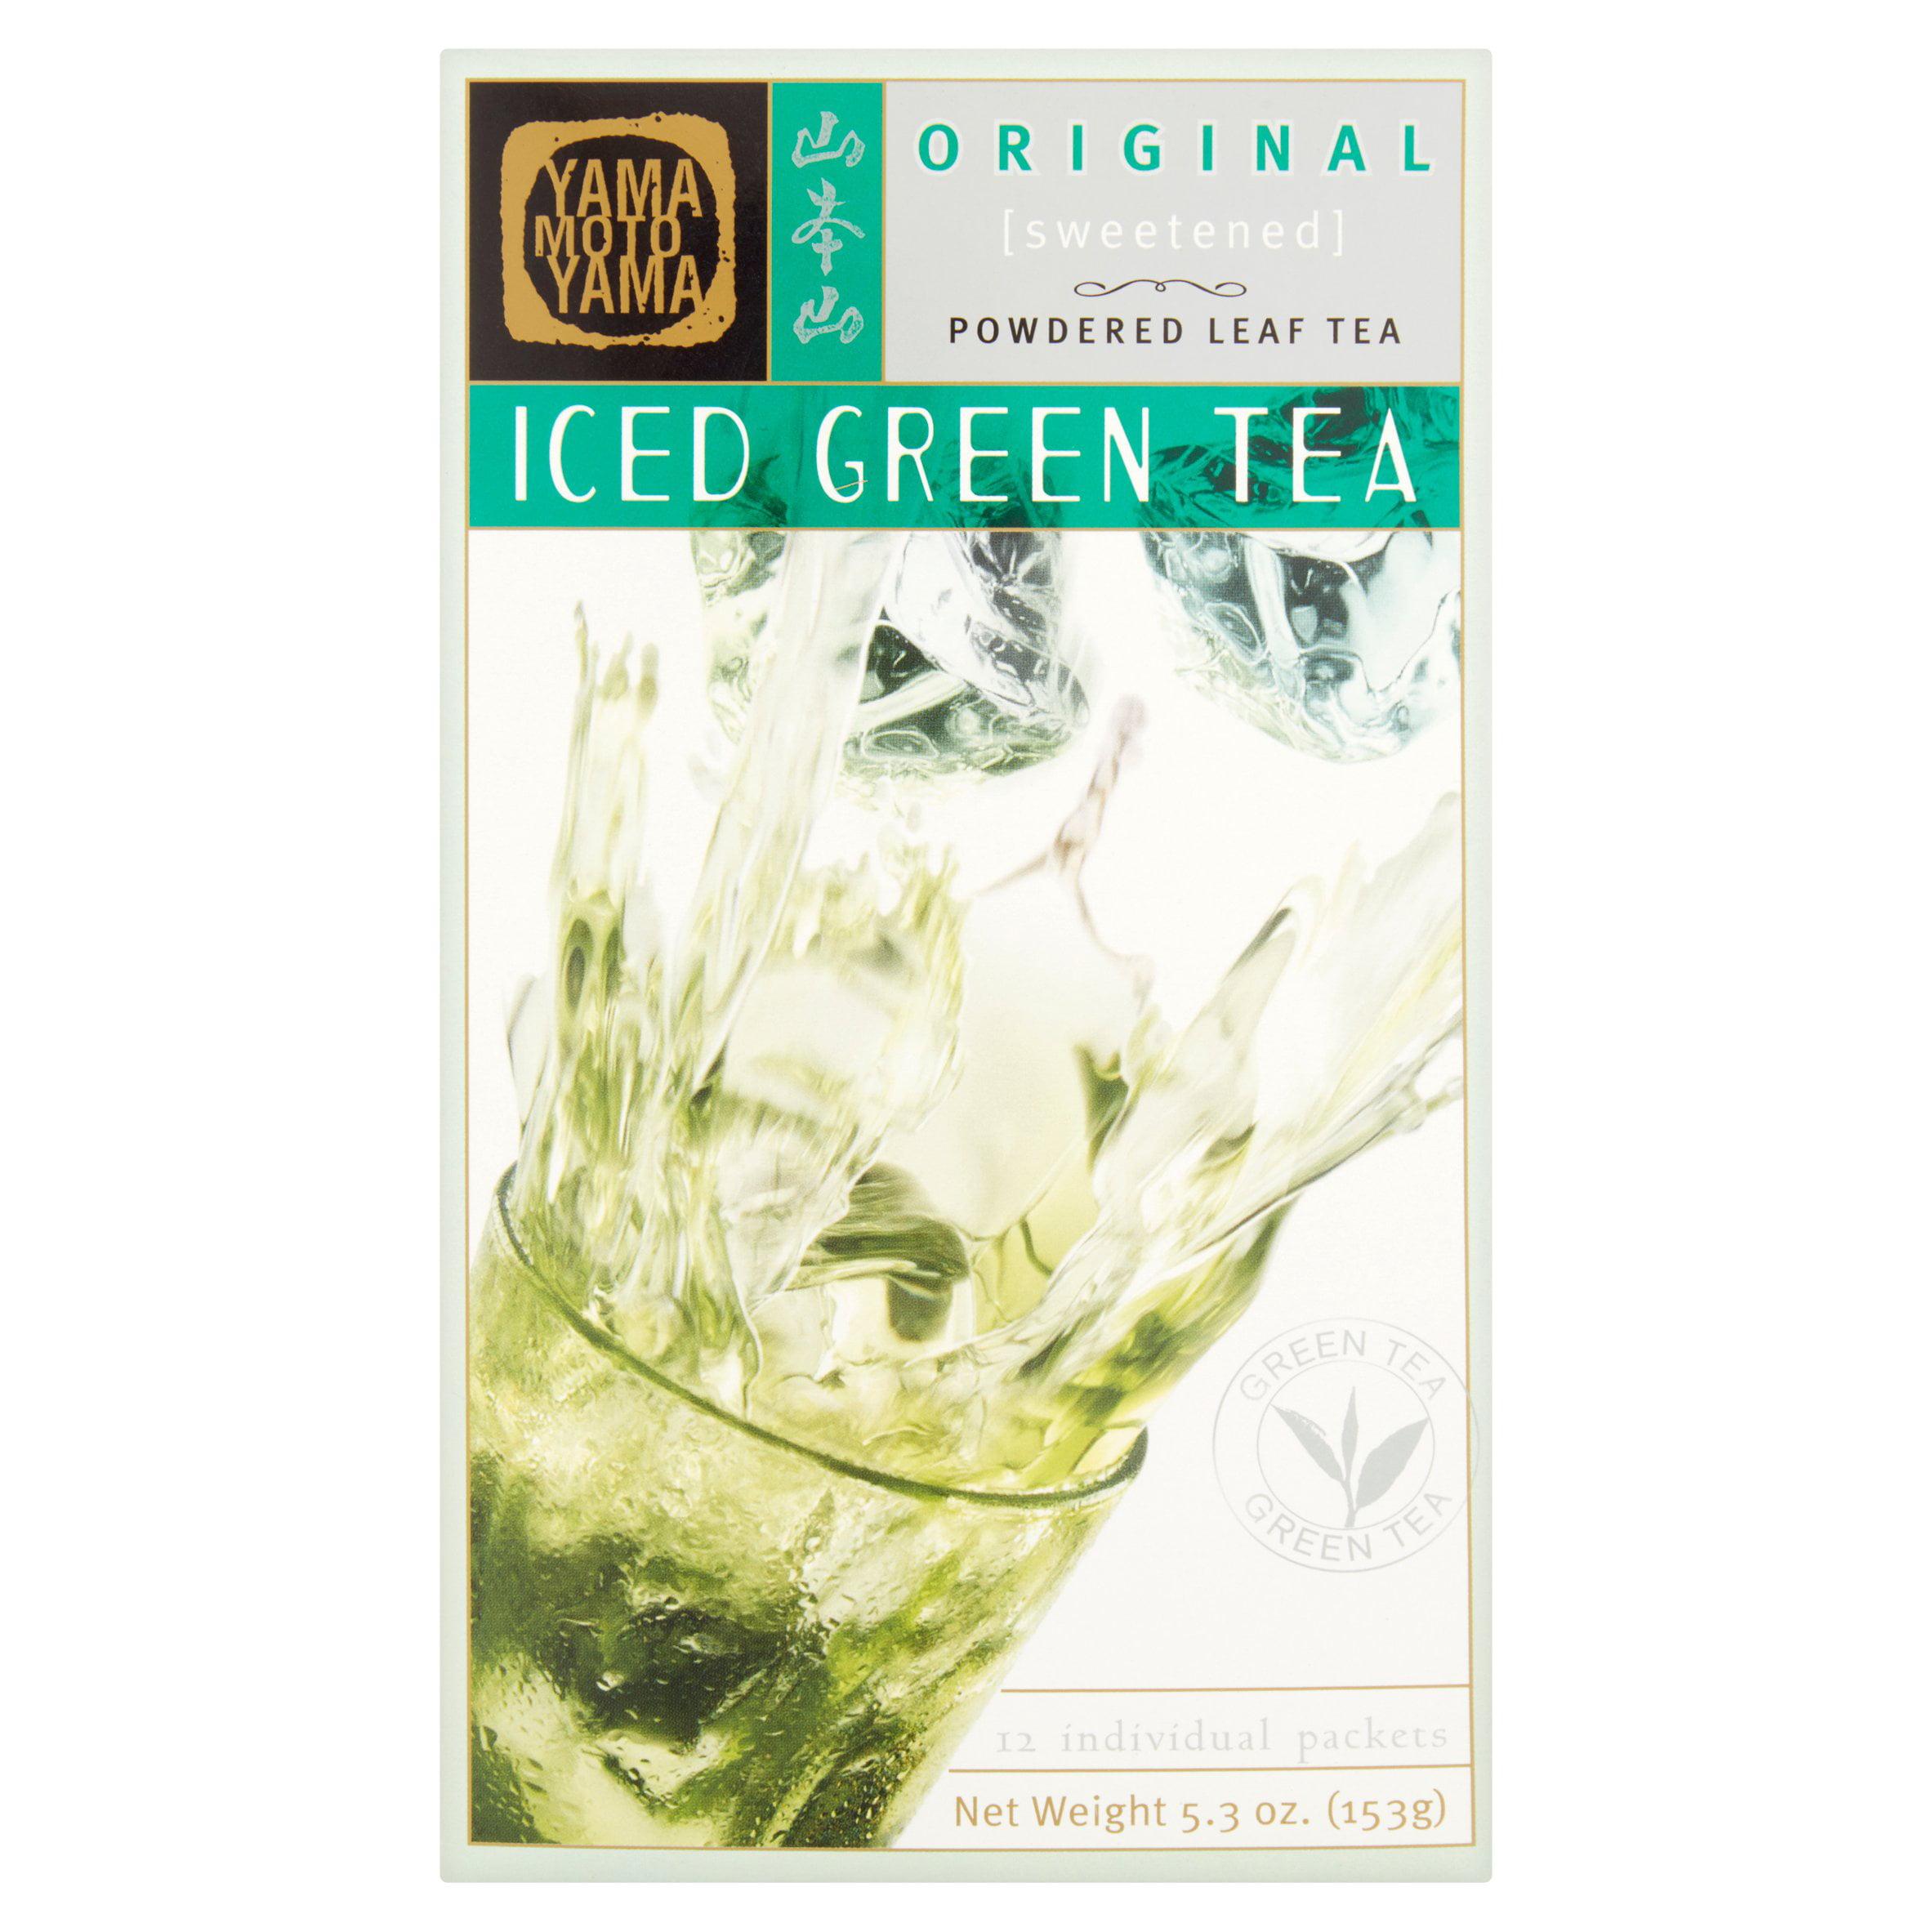 Yamamotoyama Powdered Leaf Tea Original Sweetened Iced Green Tea, 5.3 Oz, 1 Count